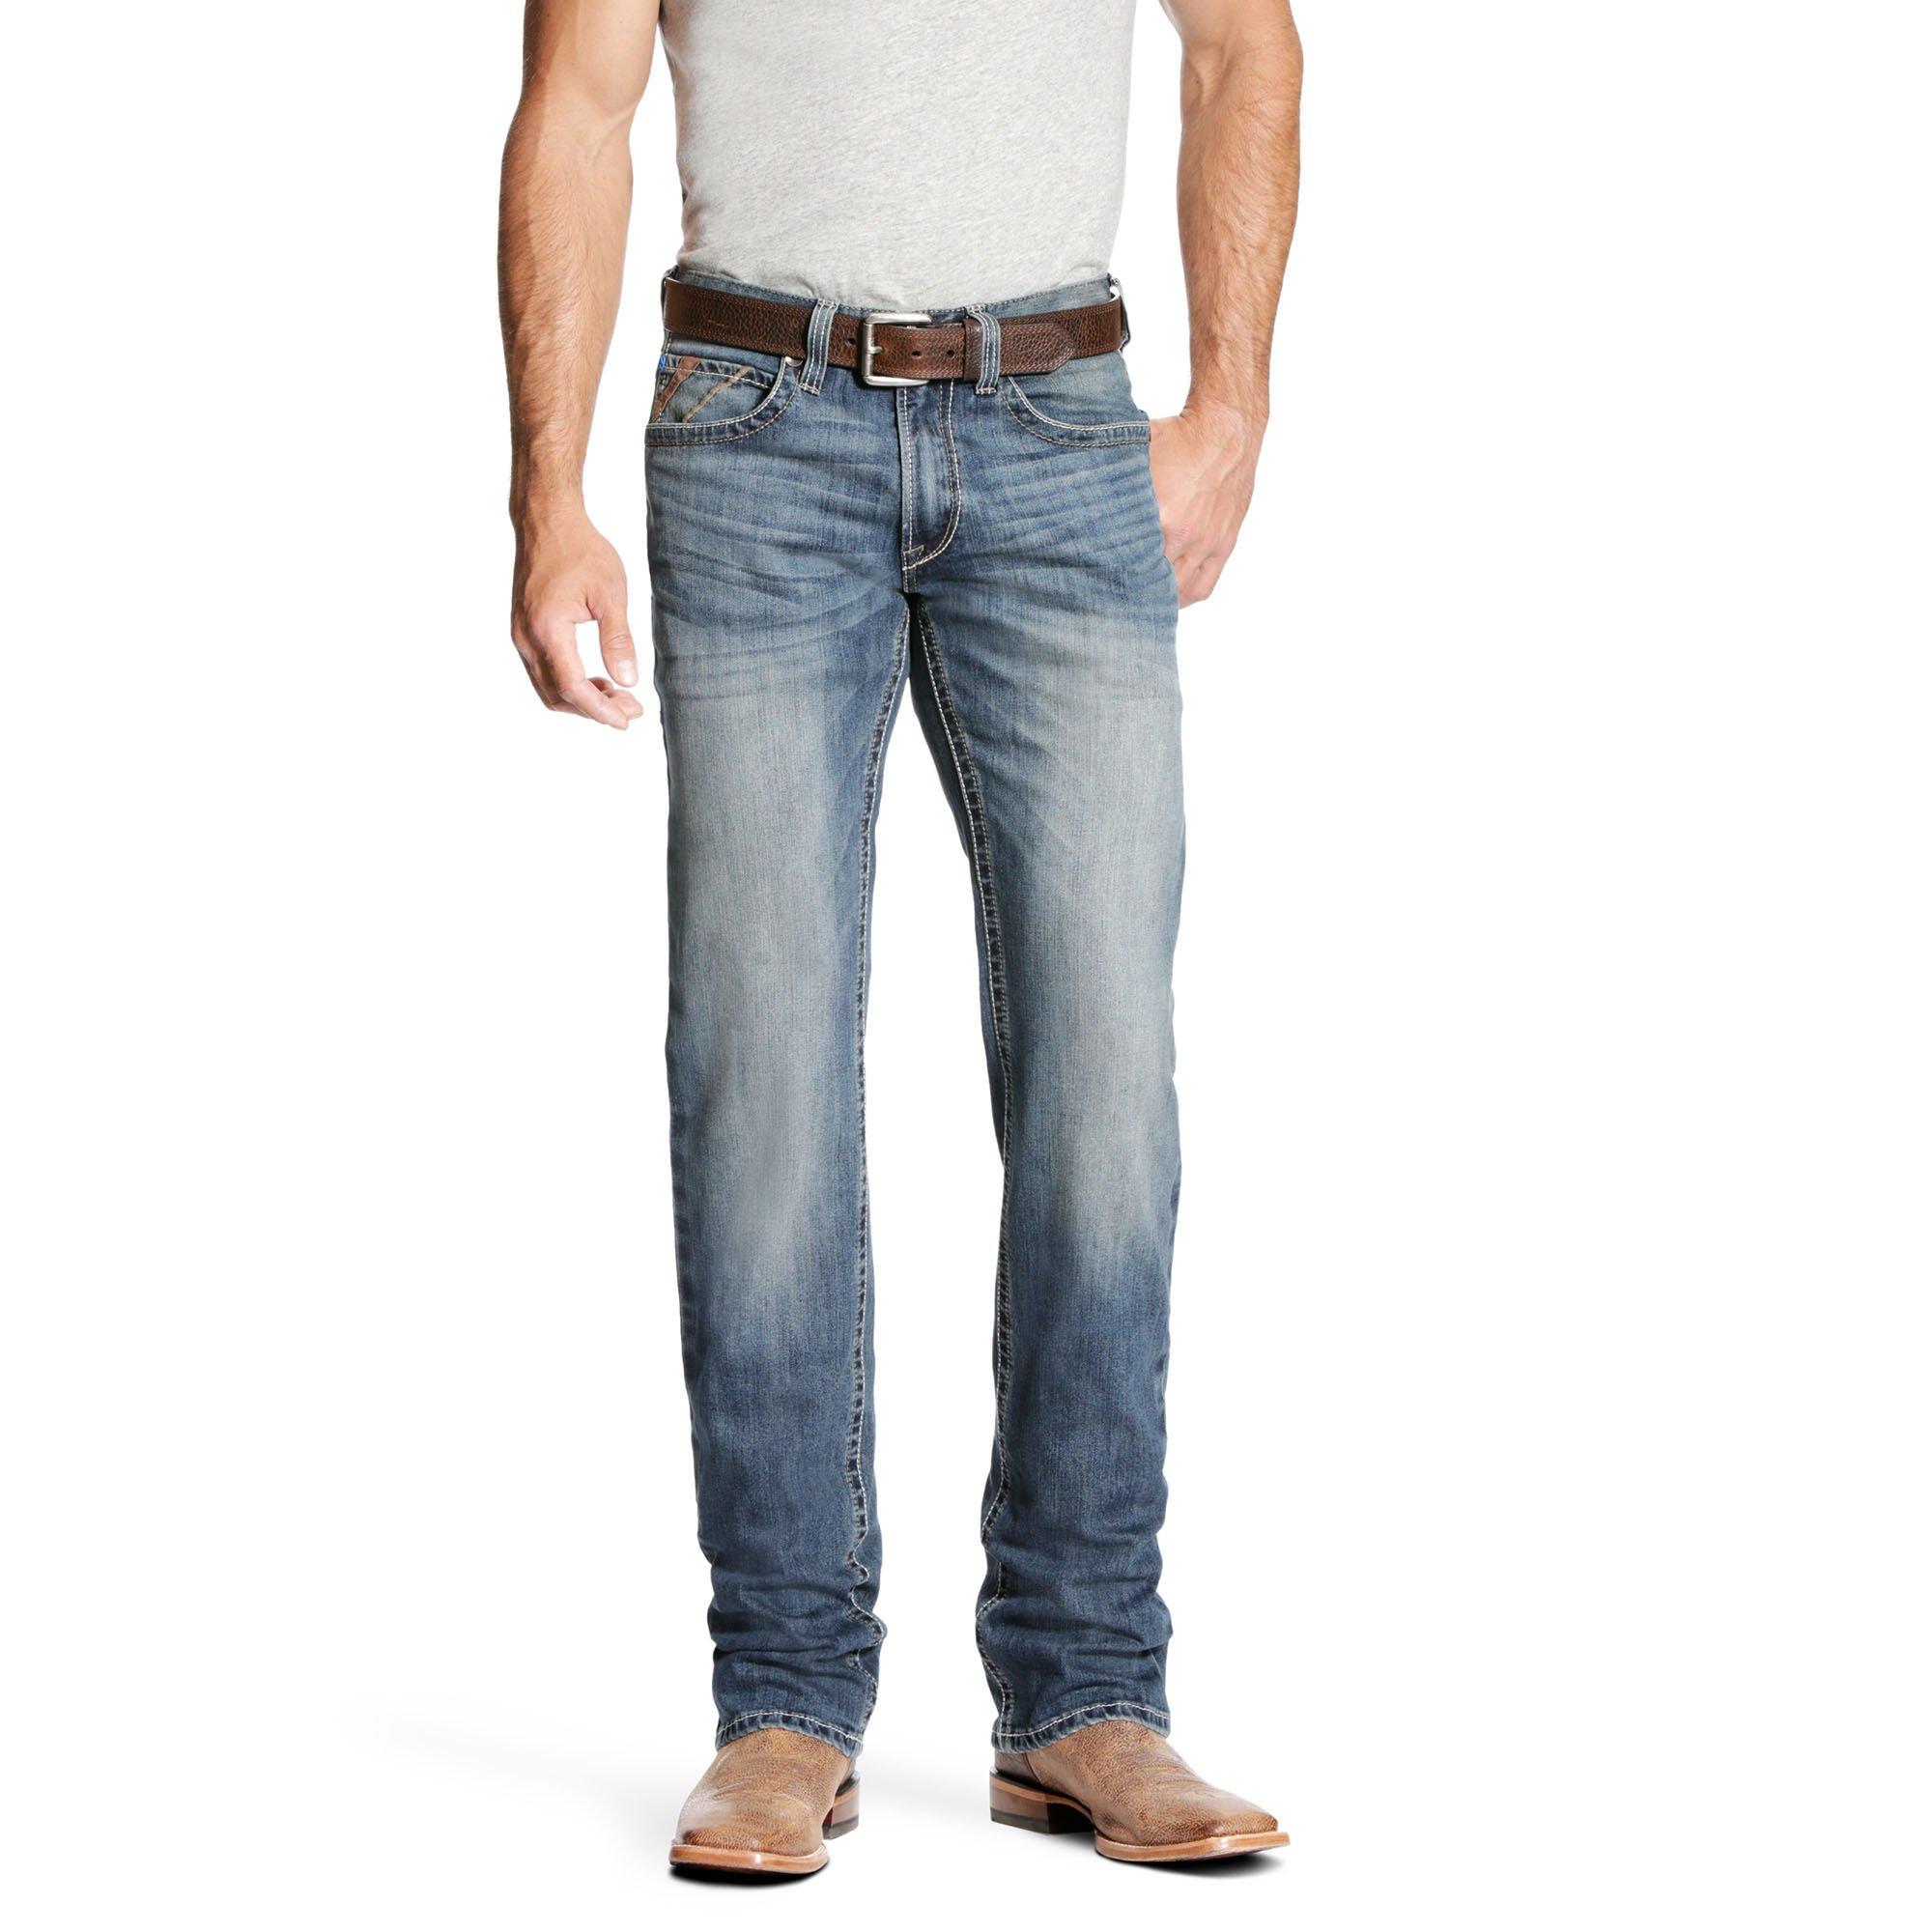 M5 Slim Jett Stretch Stackable Straight Leg Jean